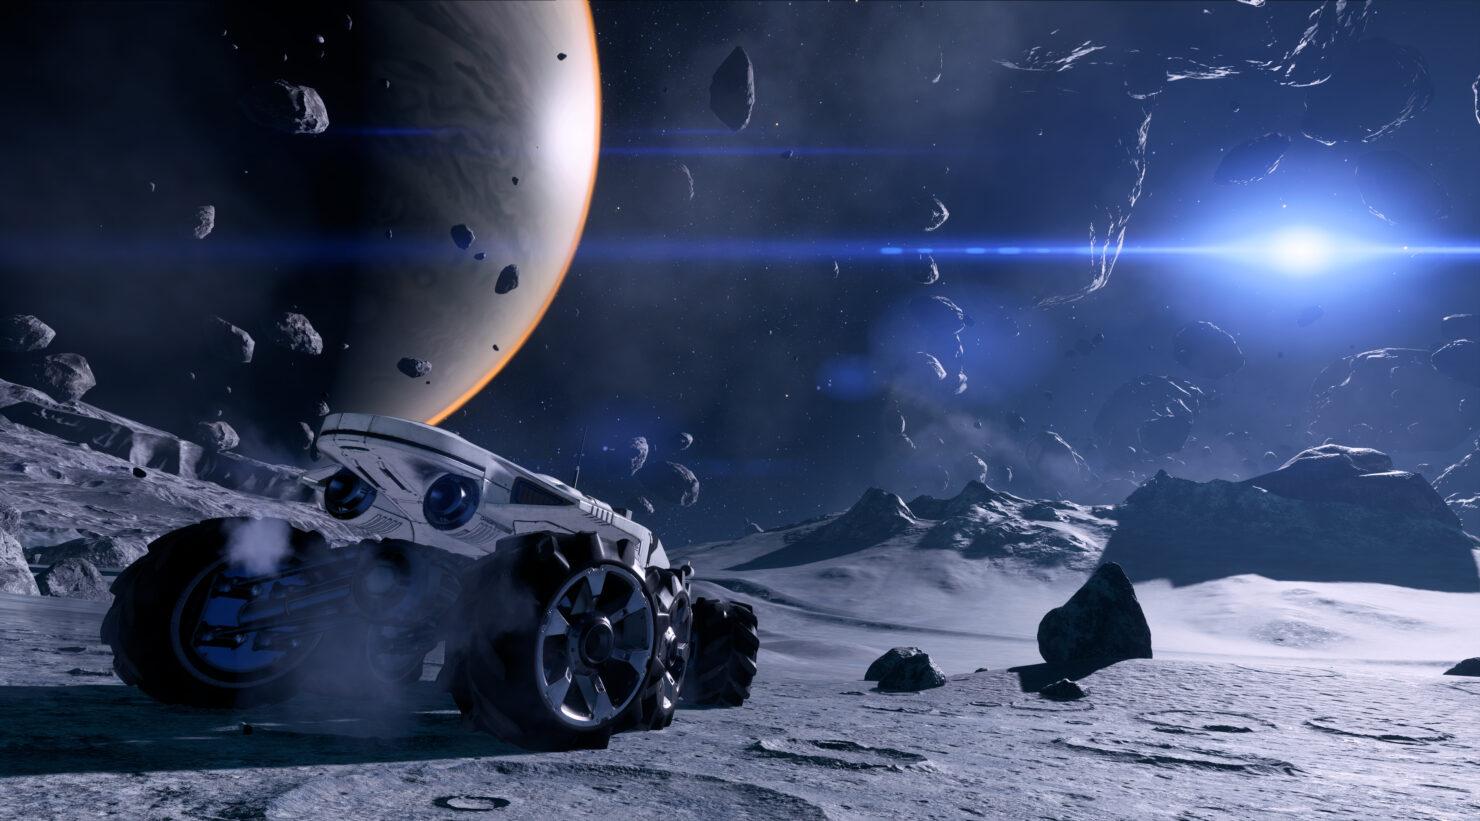 Mass Effect Andromeda Story DLC